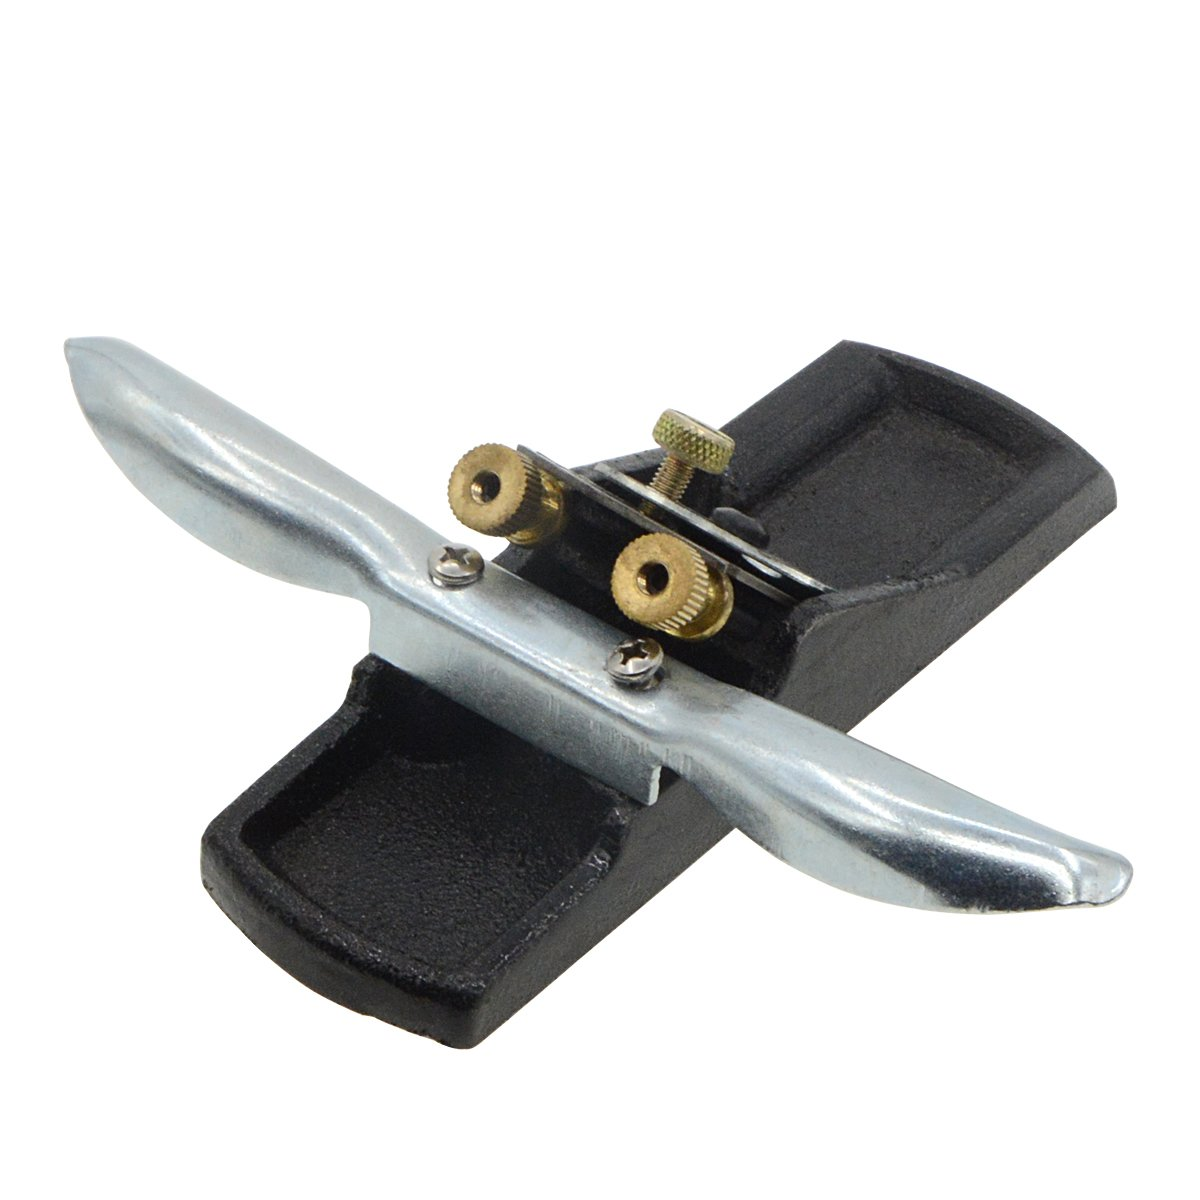 Saim DIY Metal Woodworking Handed Plane Tools Adjustable Woodwork Spokeshave Base Heavy Duty Flat Manual Planer for Wood Craft, Wood Craver, 38mm Cutter Width,184mm Handgrip Length, Silver and Black by Saim (Image #3)